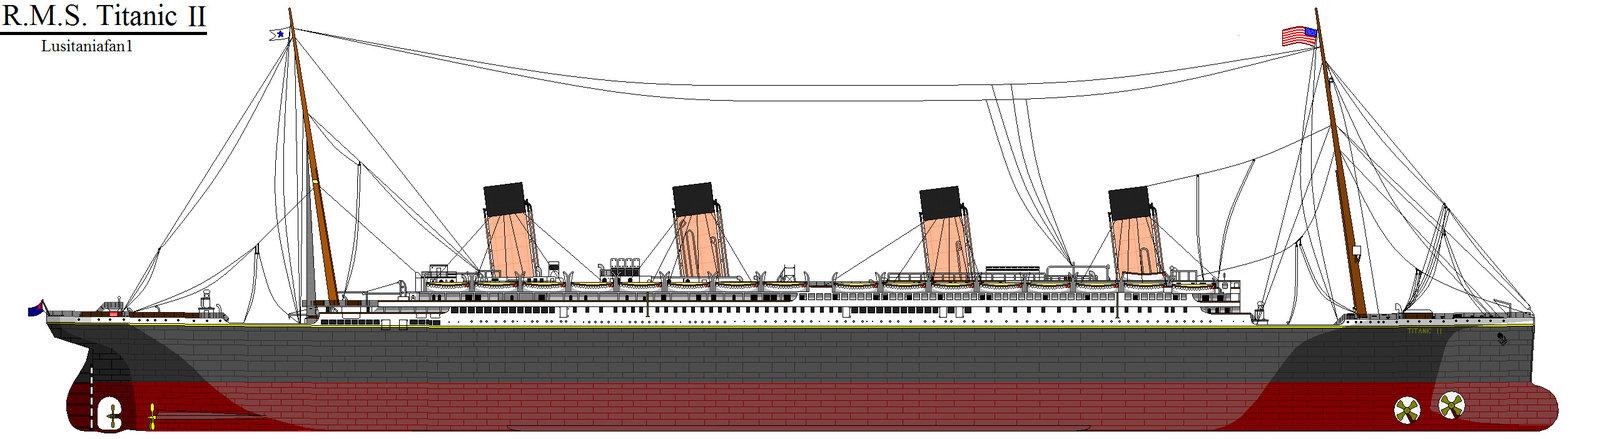 Drawn titanic titanic 2 RMS on II DeviantArt RMS